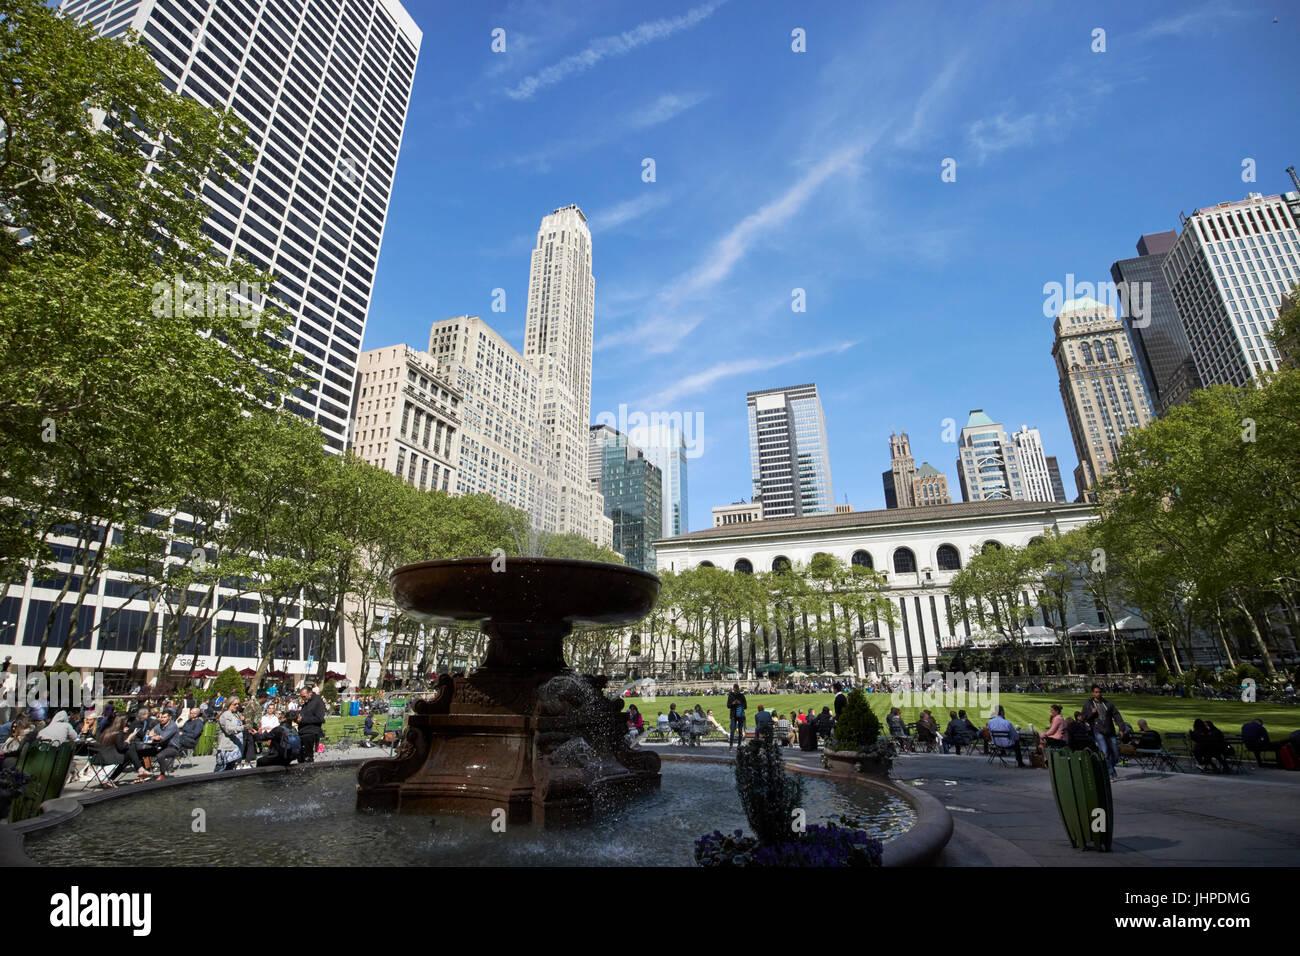 Josephine Shaw Lowell memorial fountain in bryant park New York City USA - Stock Image